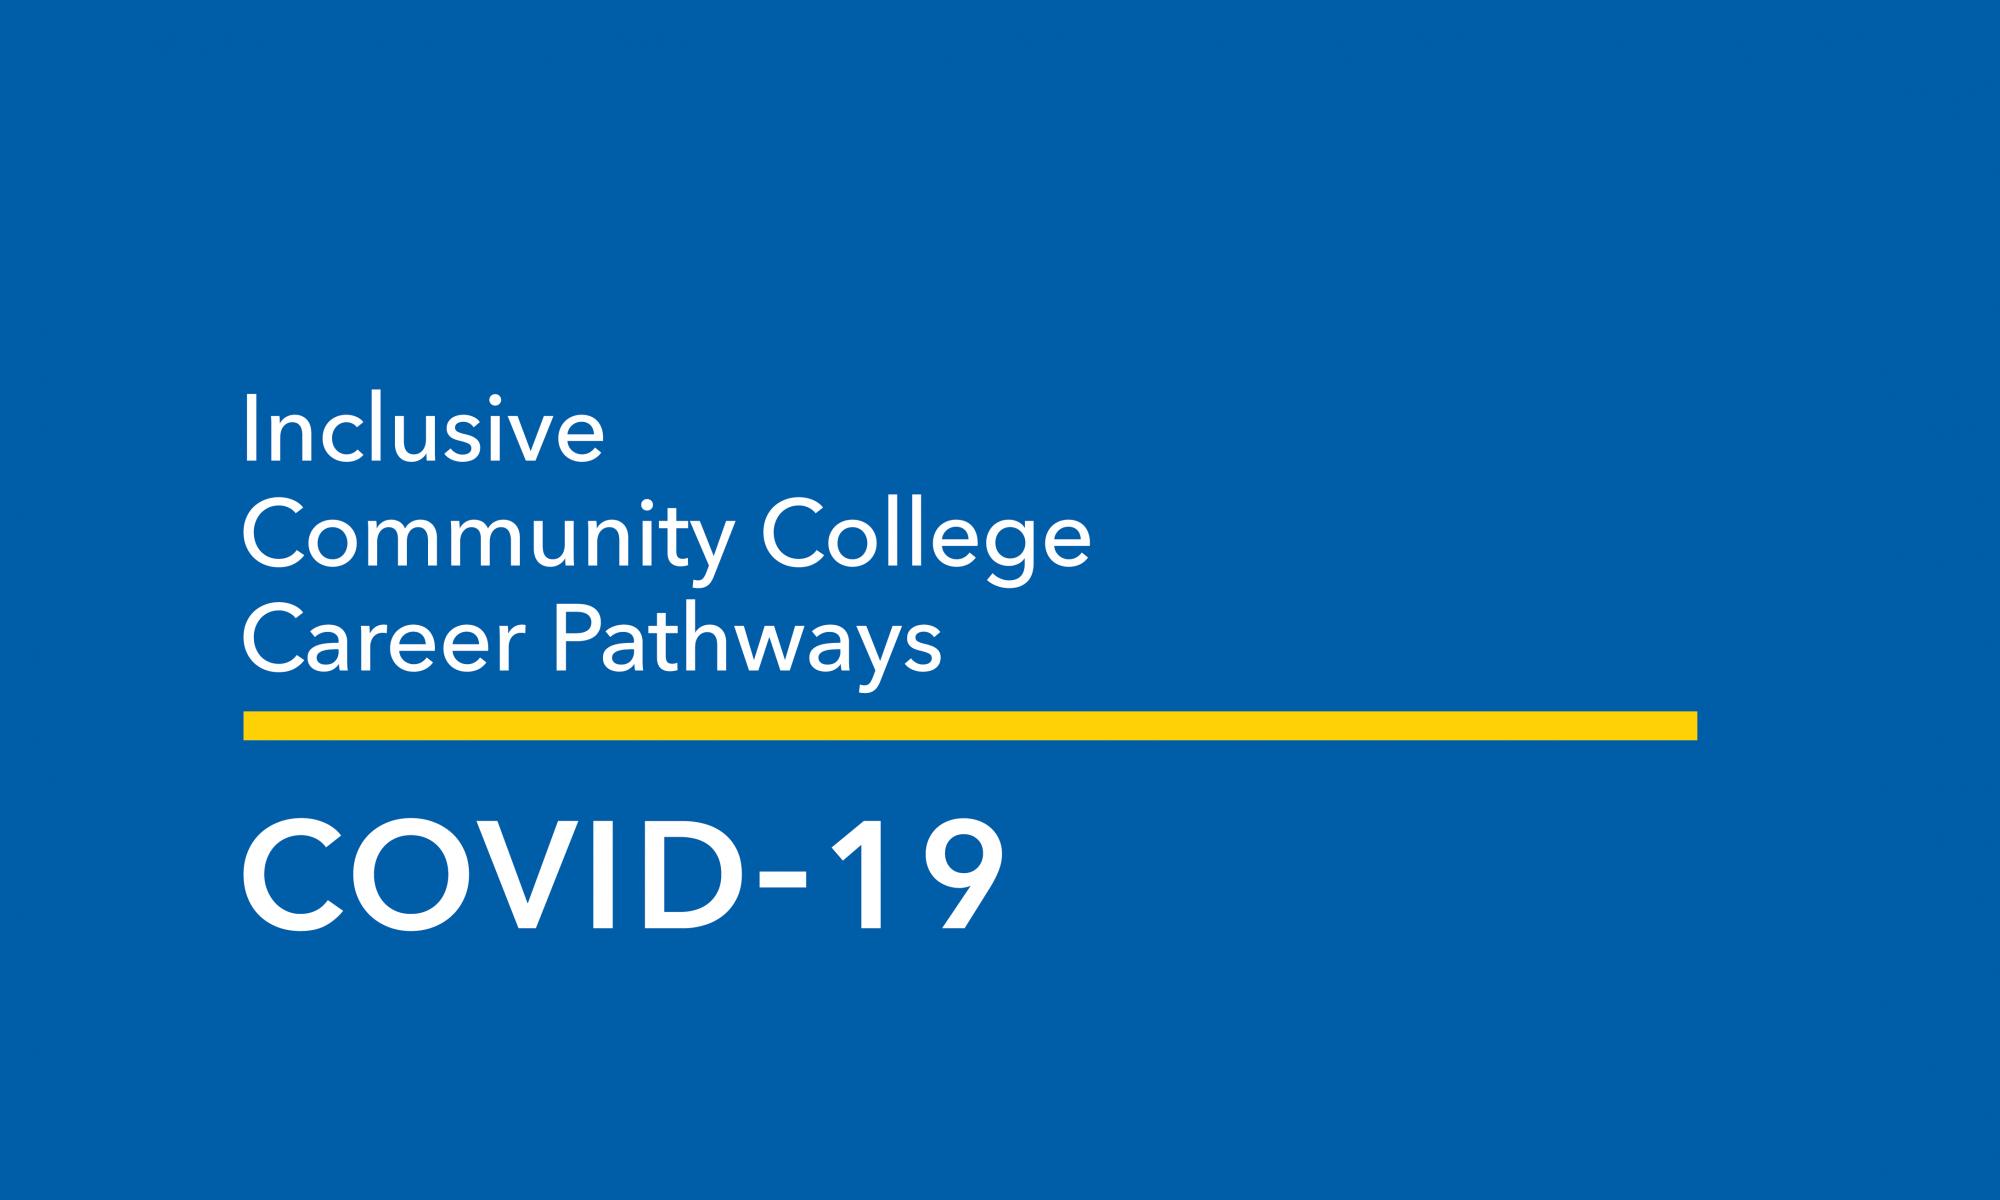 Inclusive Community College Career Pathways: COVID-19